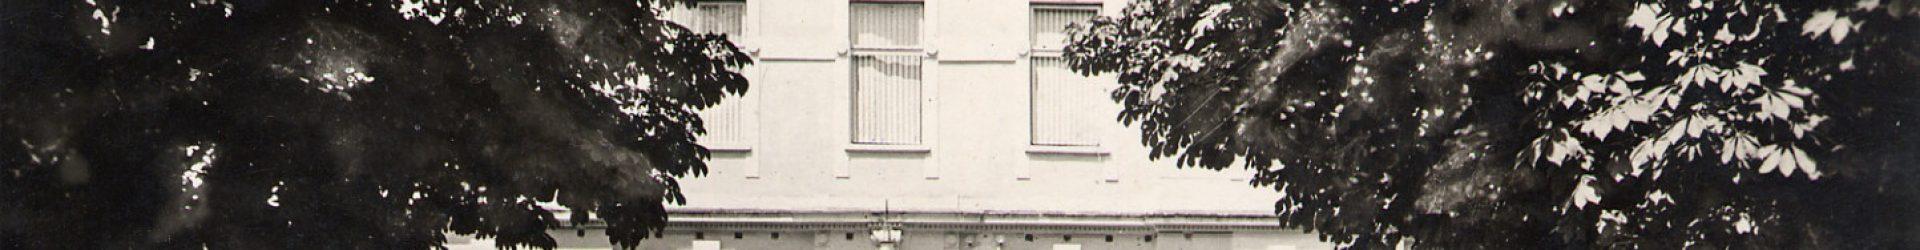 Stara bolnica, Pakrac, 1943.